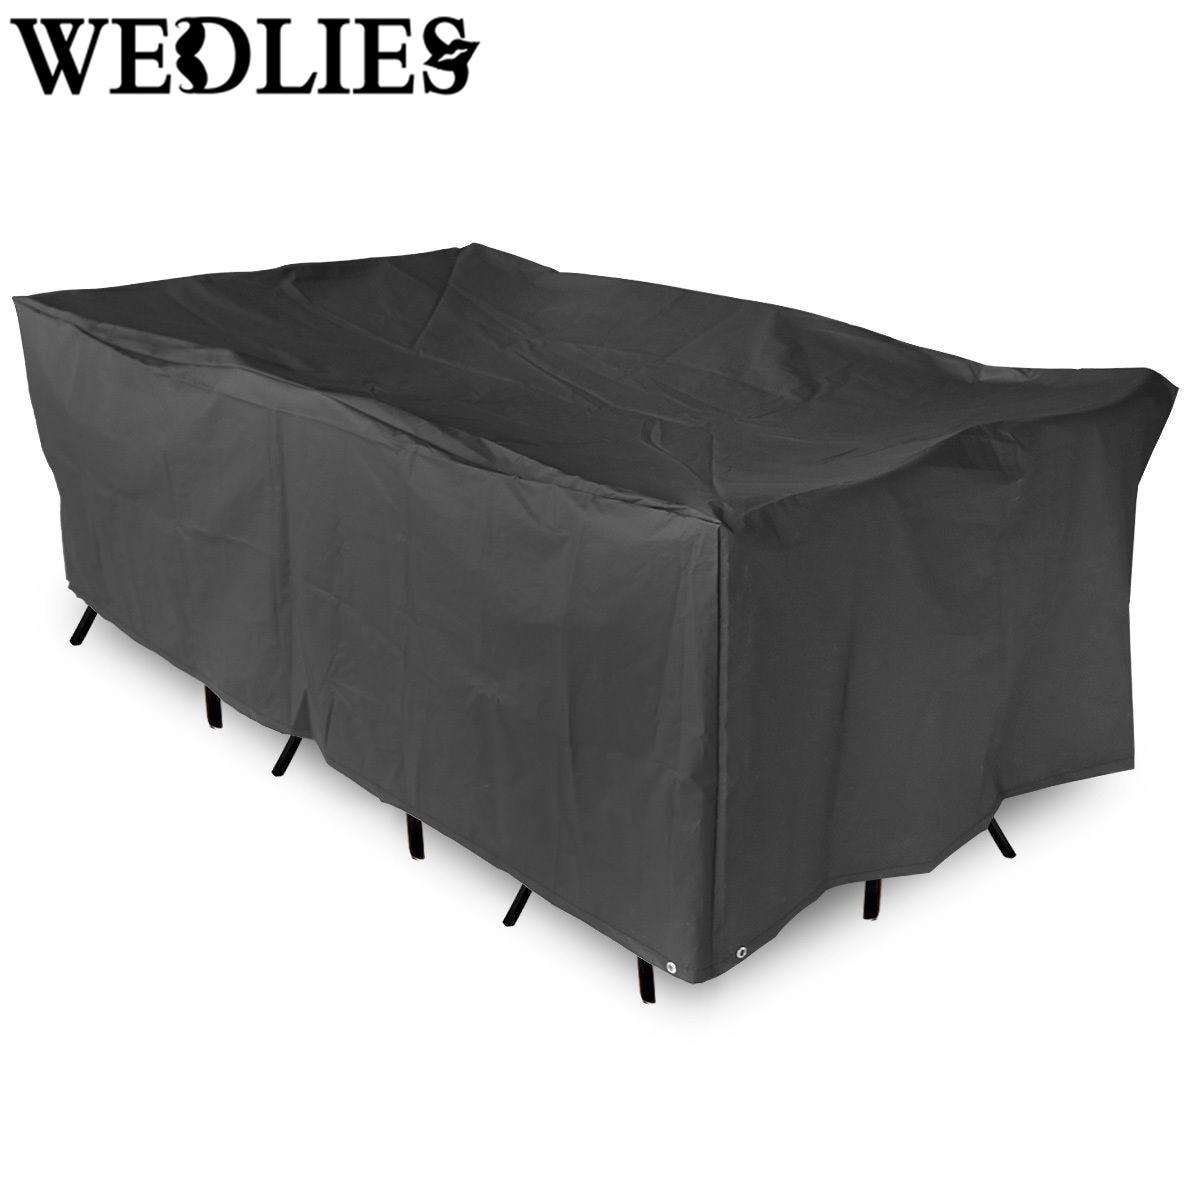 Polyester Garden Patio Table Cover Waterproof Outdoor ...